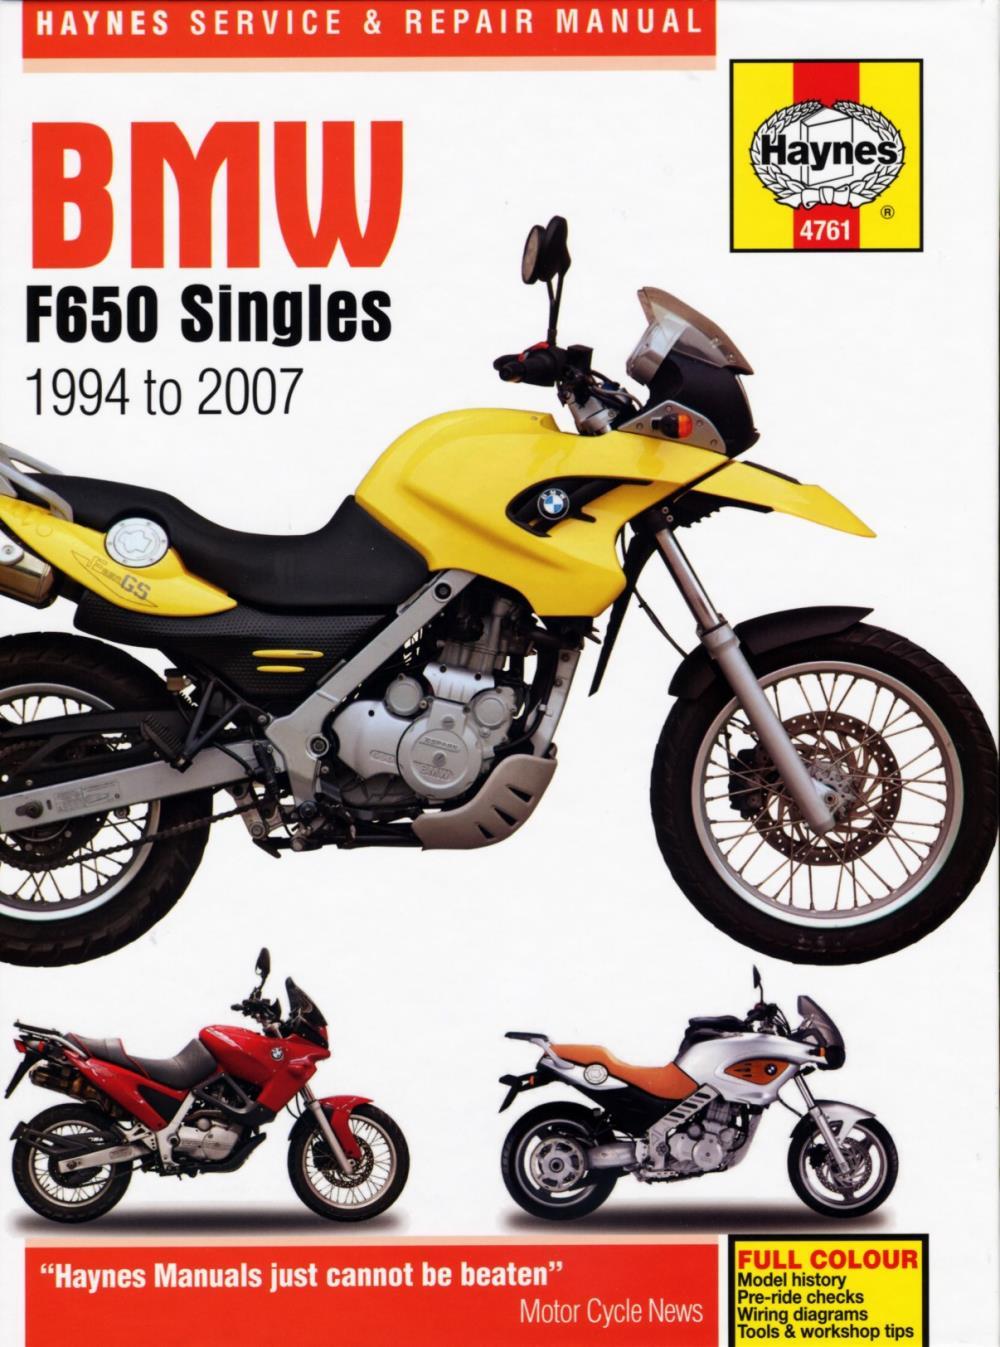 medium resolution of image is loading manual haynes for 1997 bmw f 650